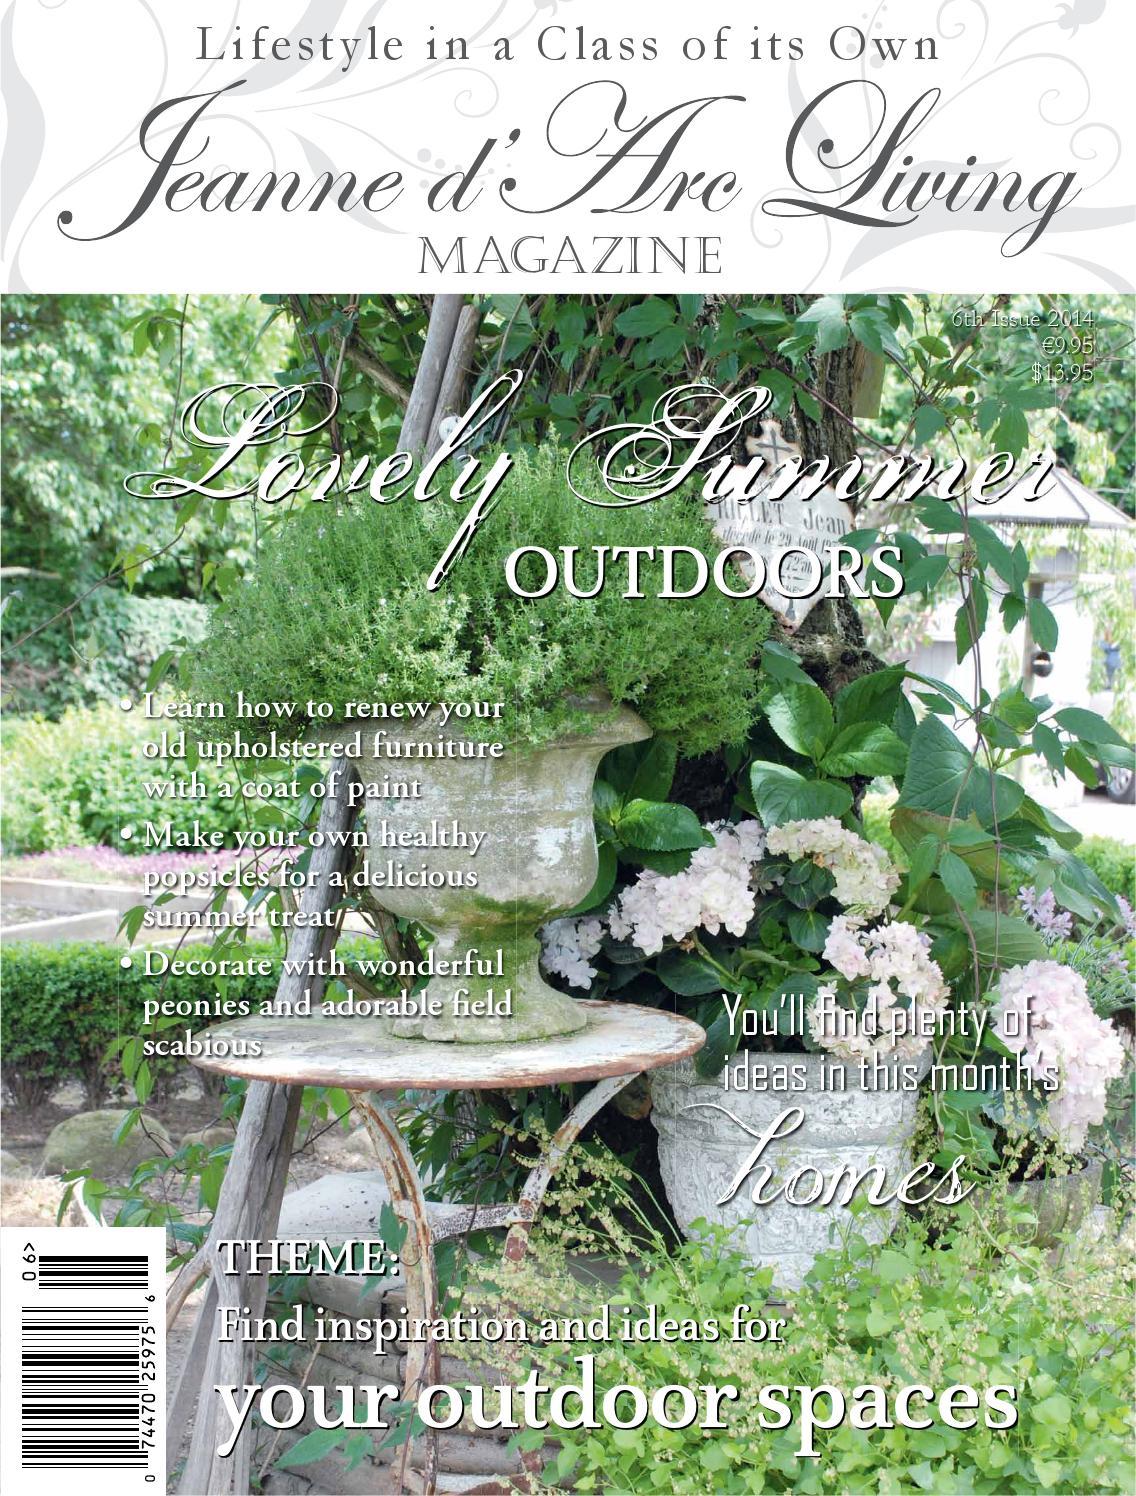 Jeanne DArc Living Magazine ISSUE 6 2014 Lovely